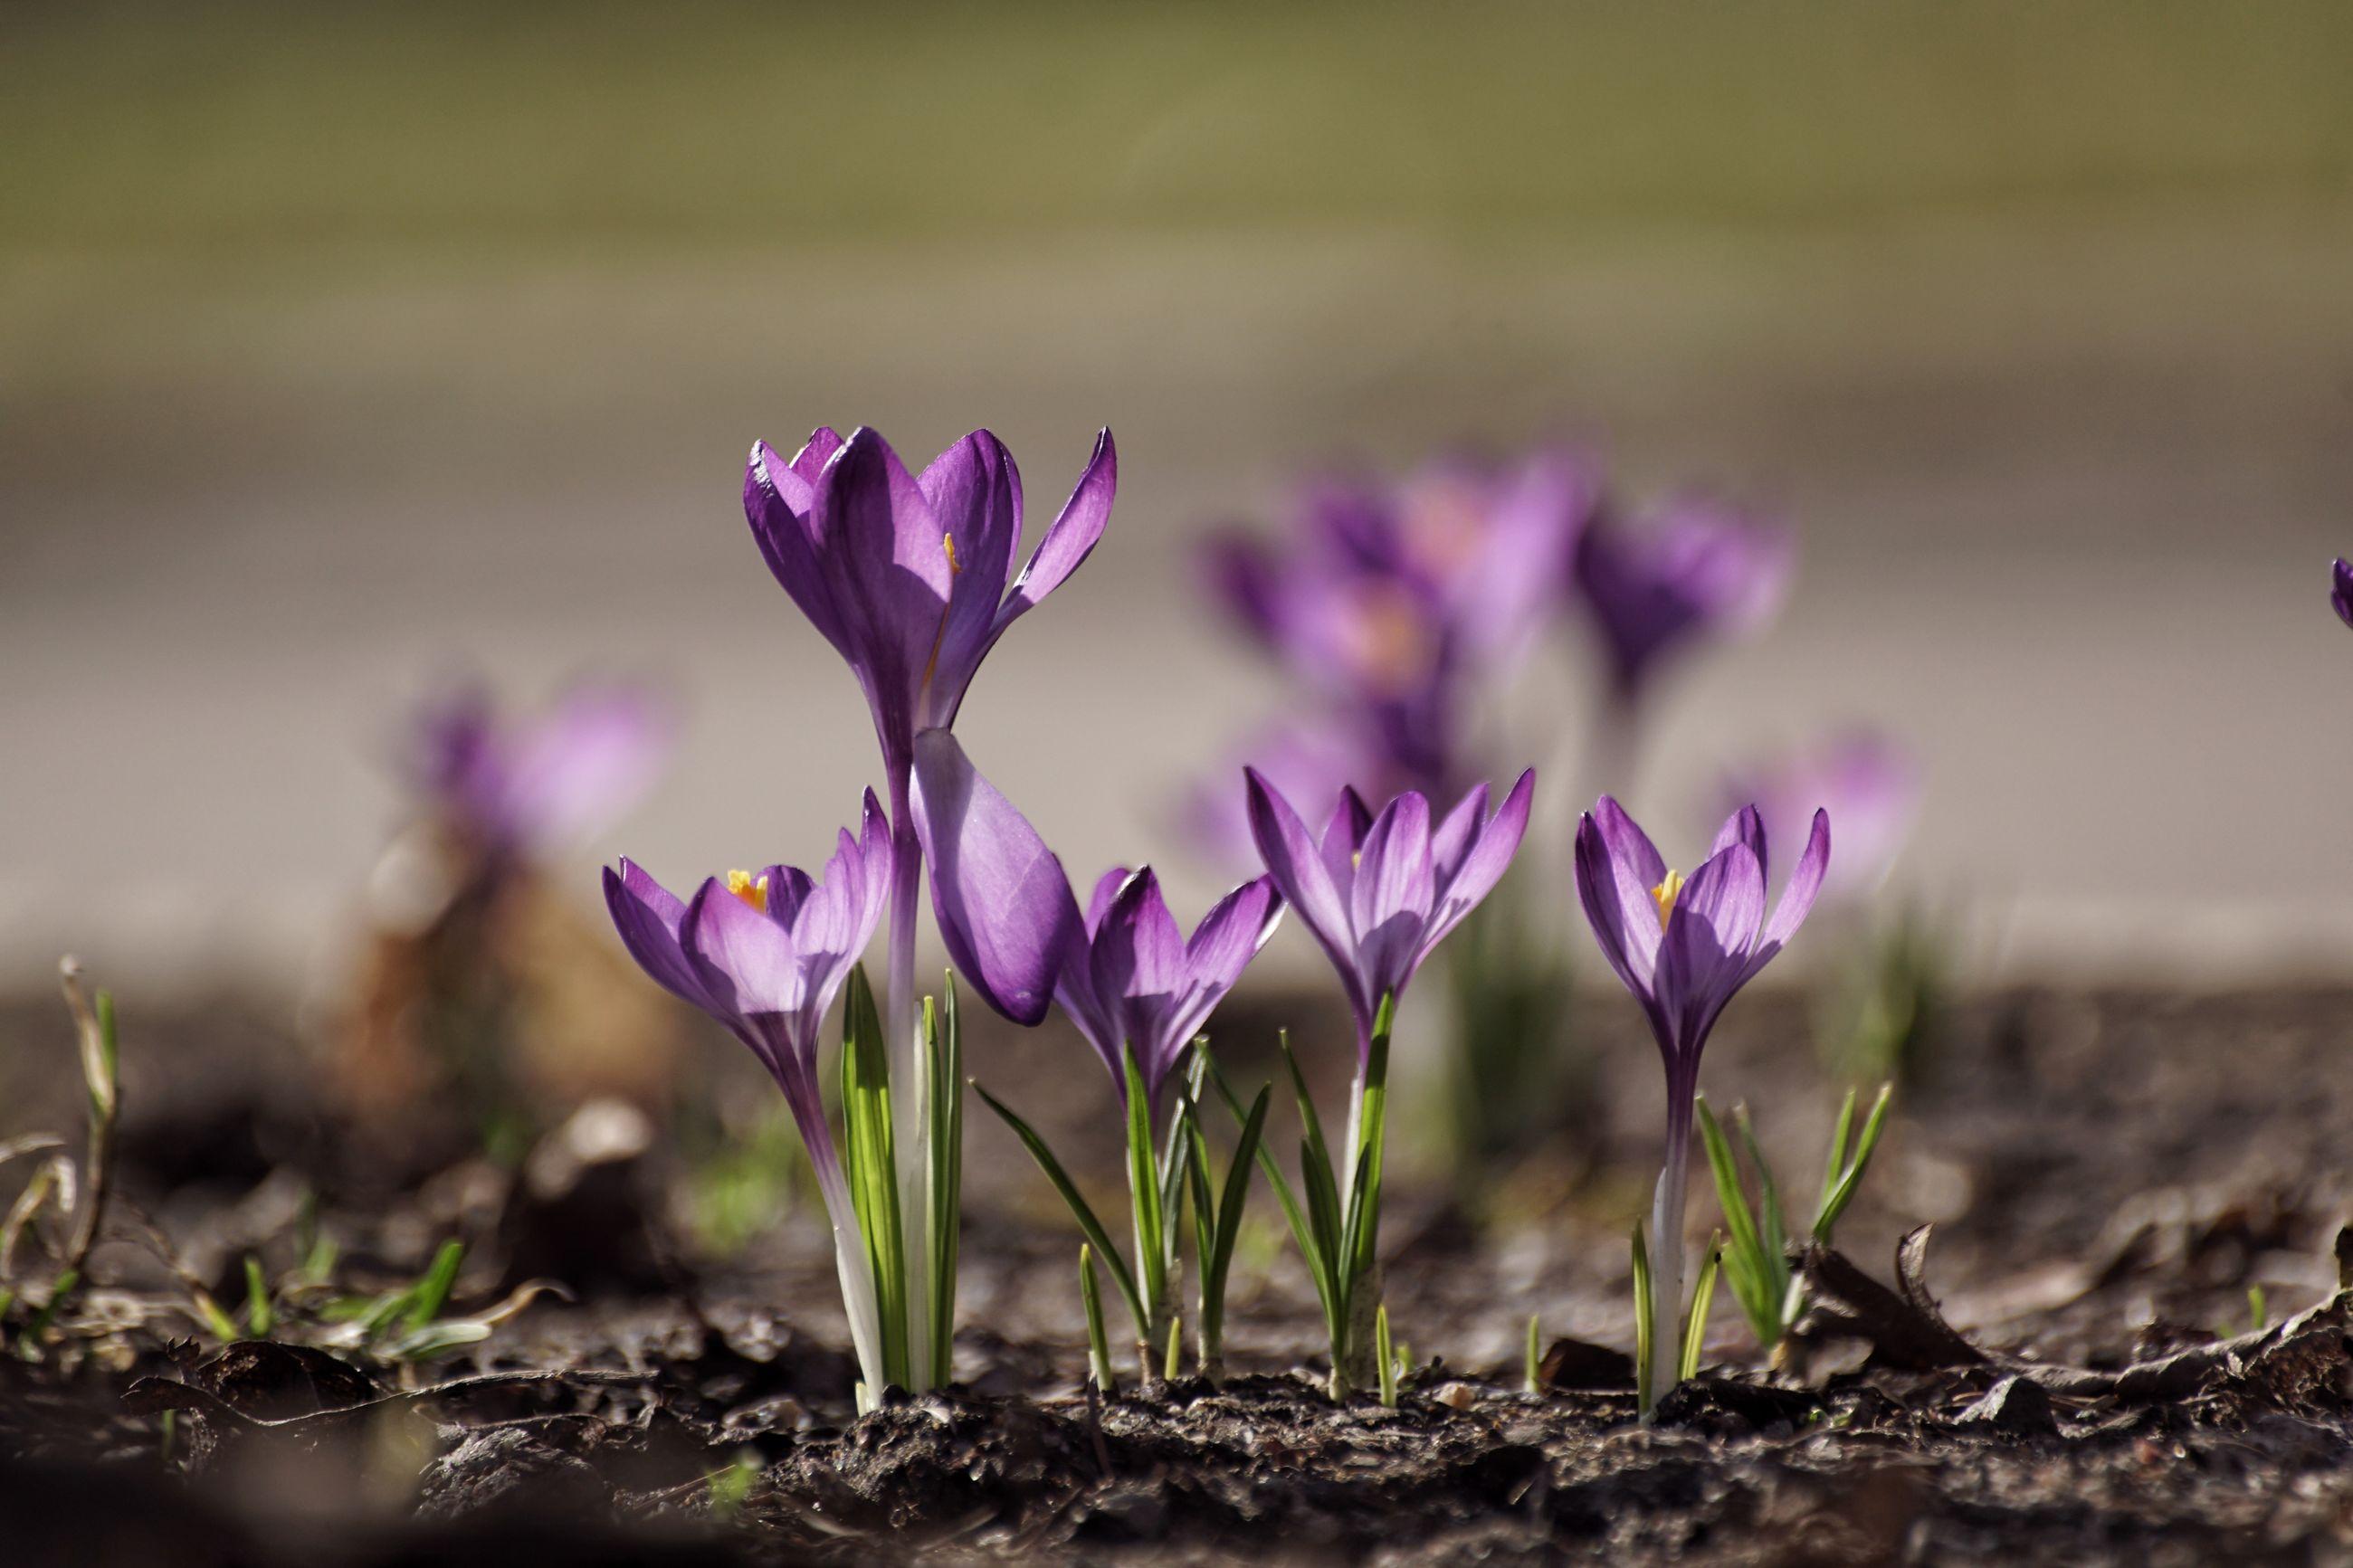 Close-up of purple crocus flowers blooming on field